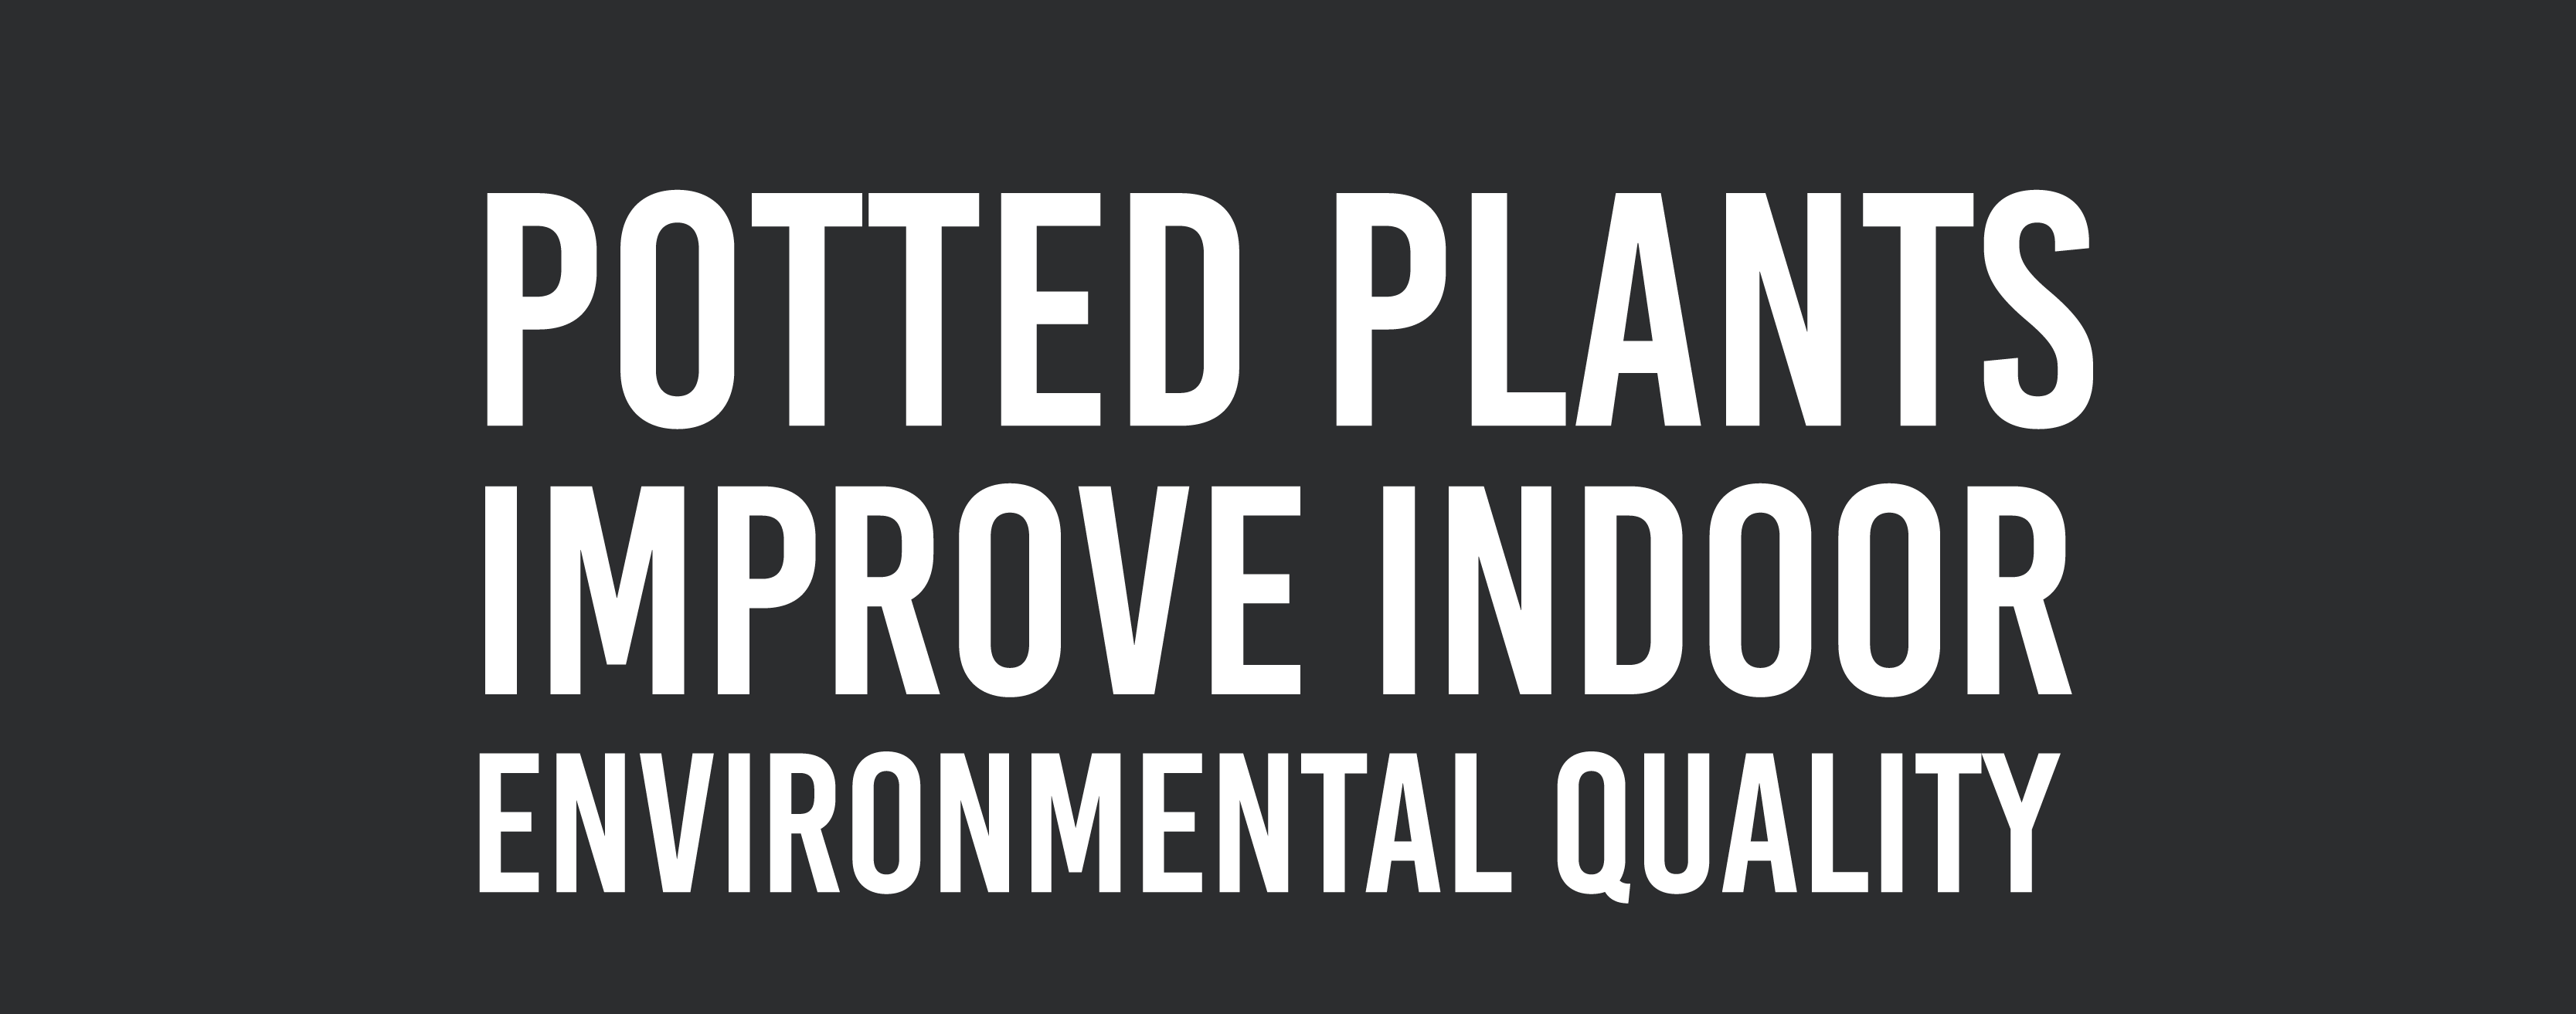 plants improve indoor environment